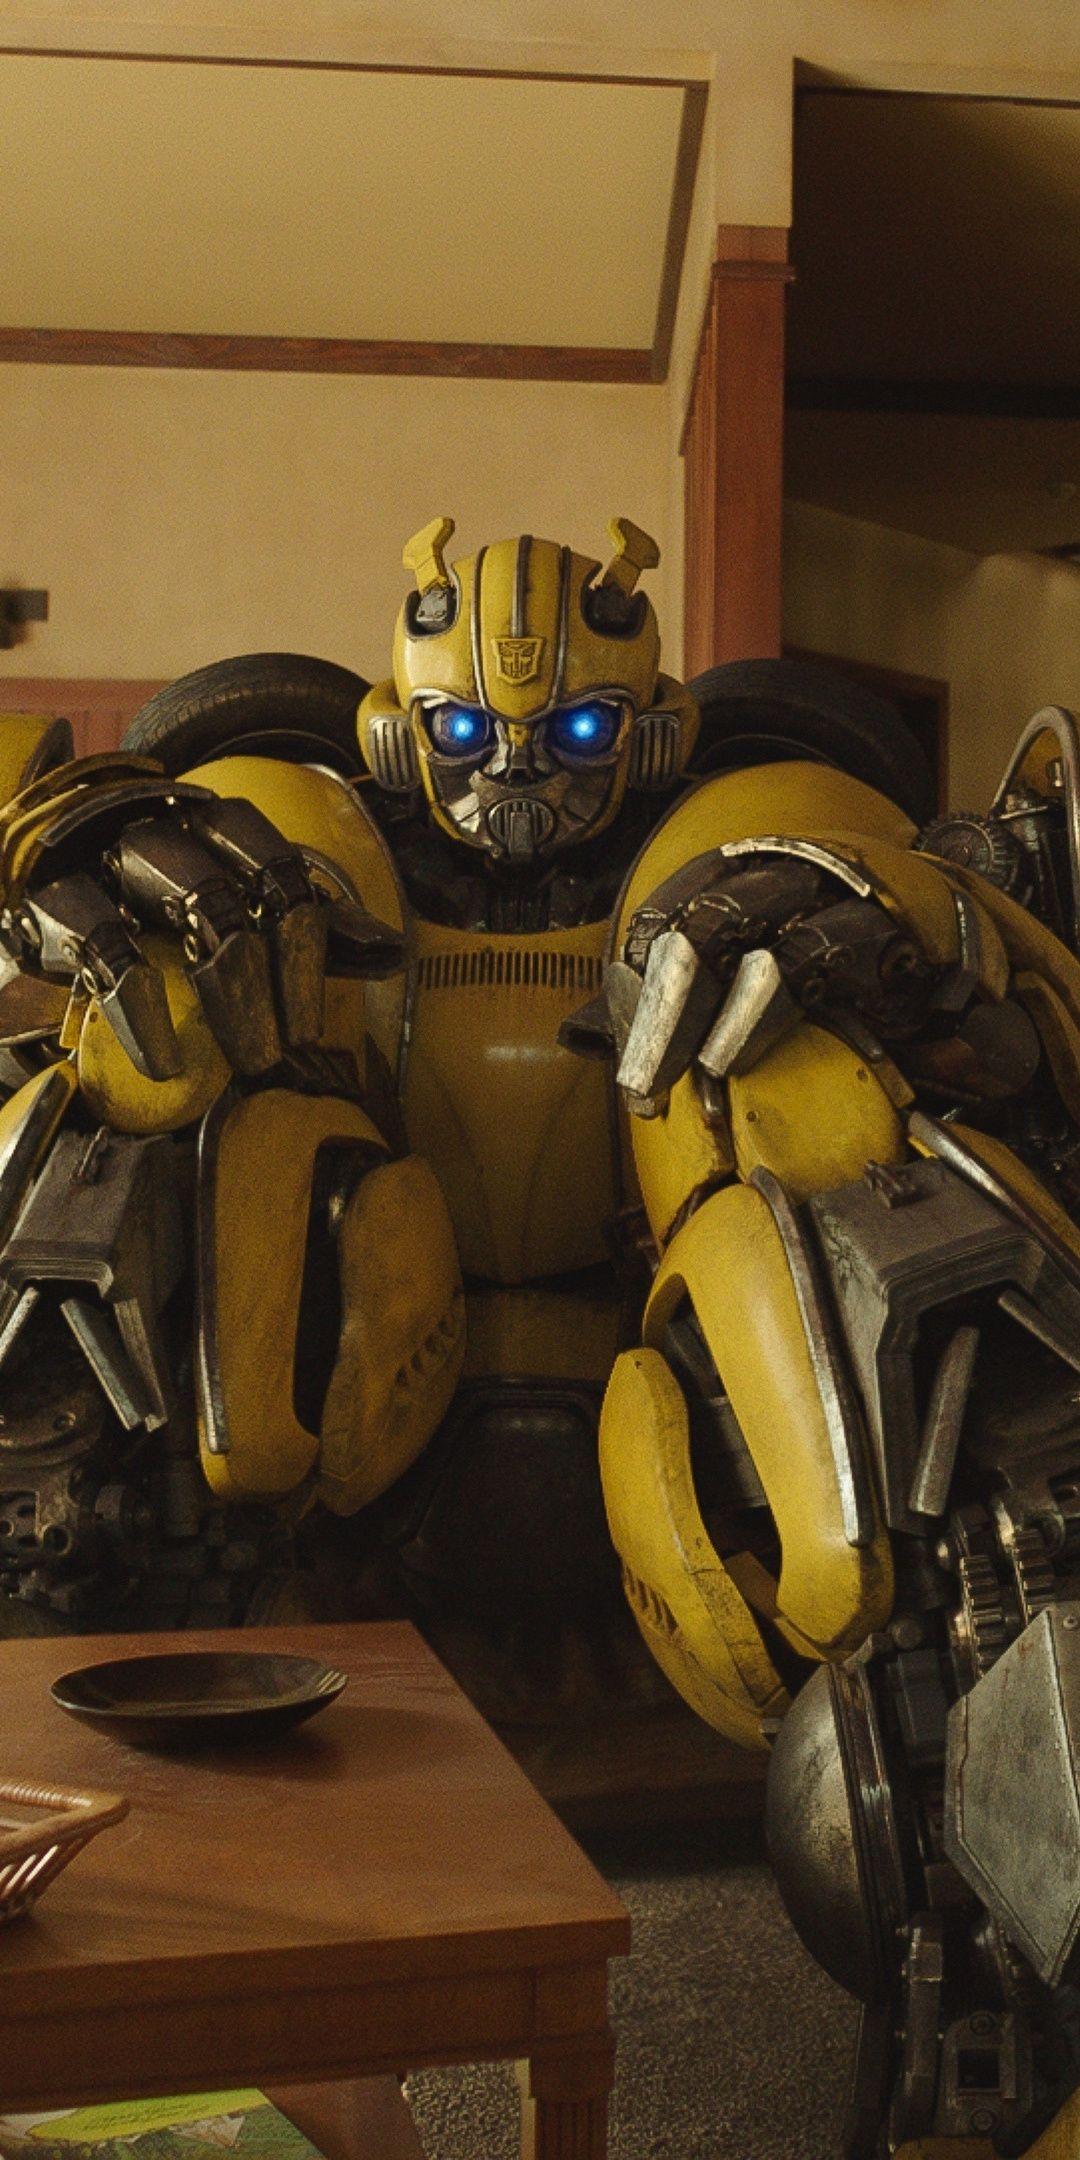 Bumblebee Robot Transformers Movie 1080x2160 Wallpaper Transformers Transformers Bumblebee Transformers Autobots